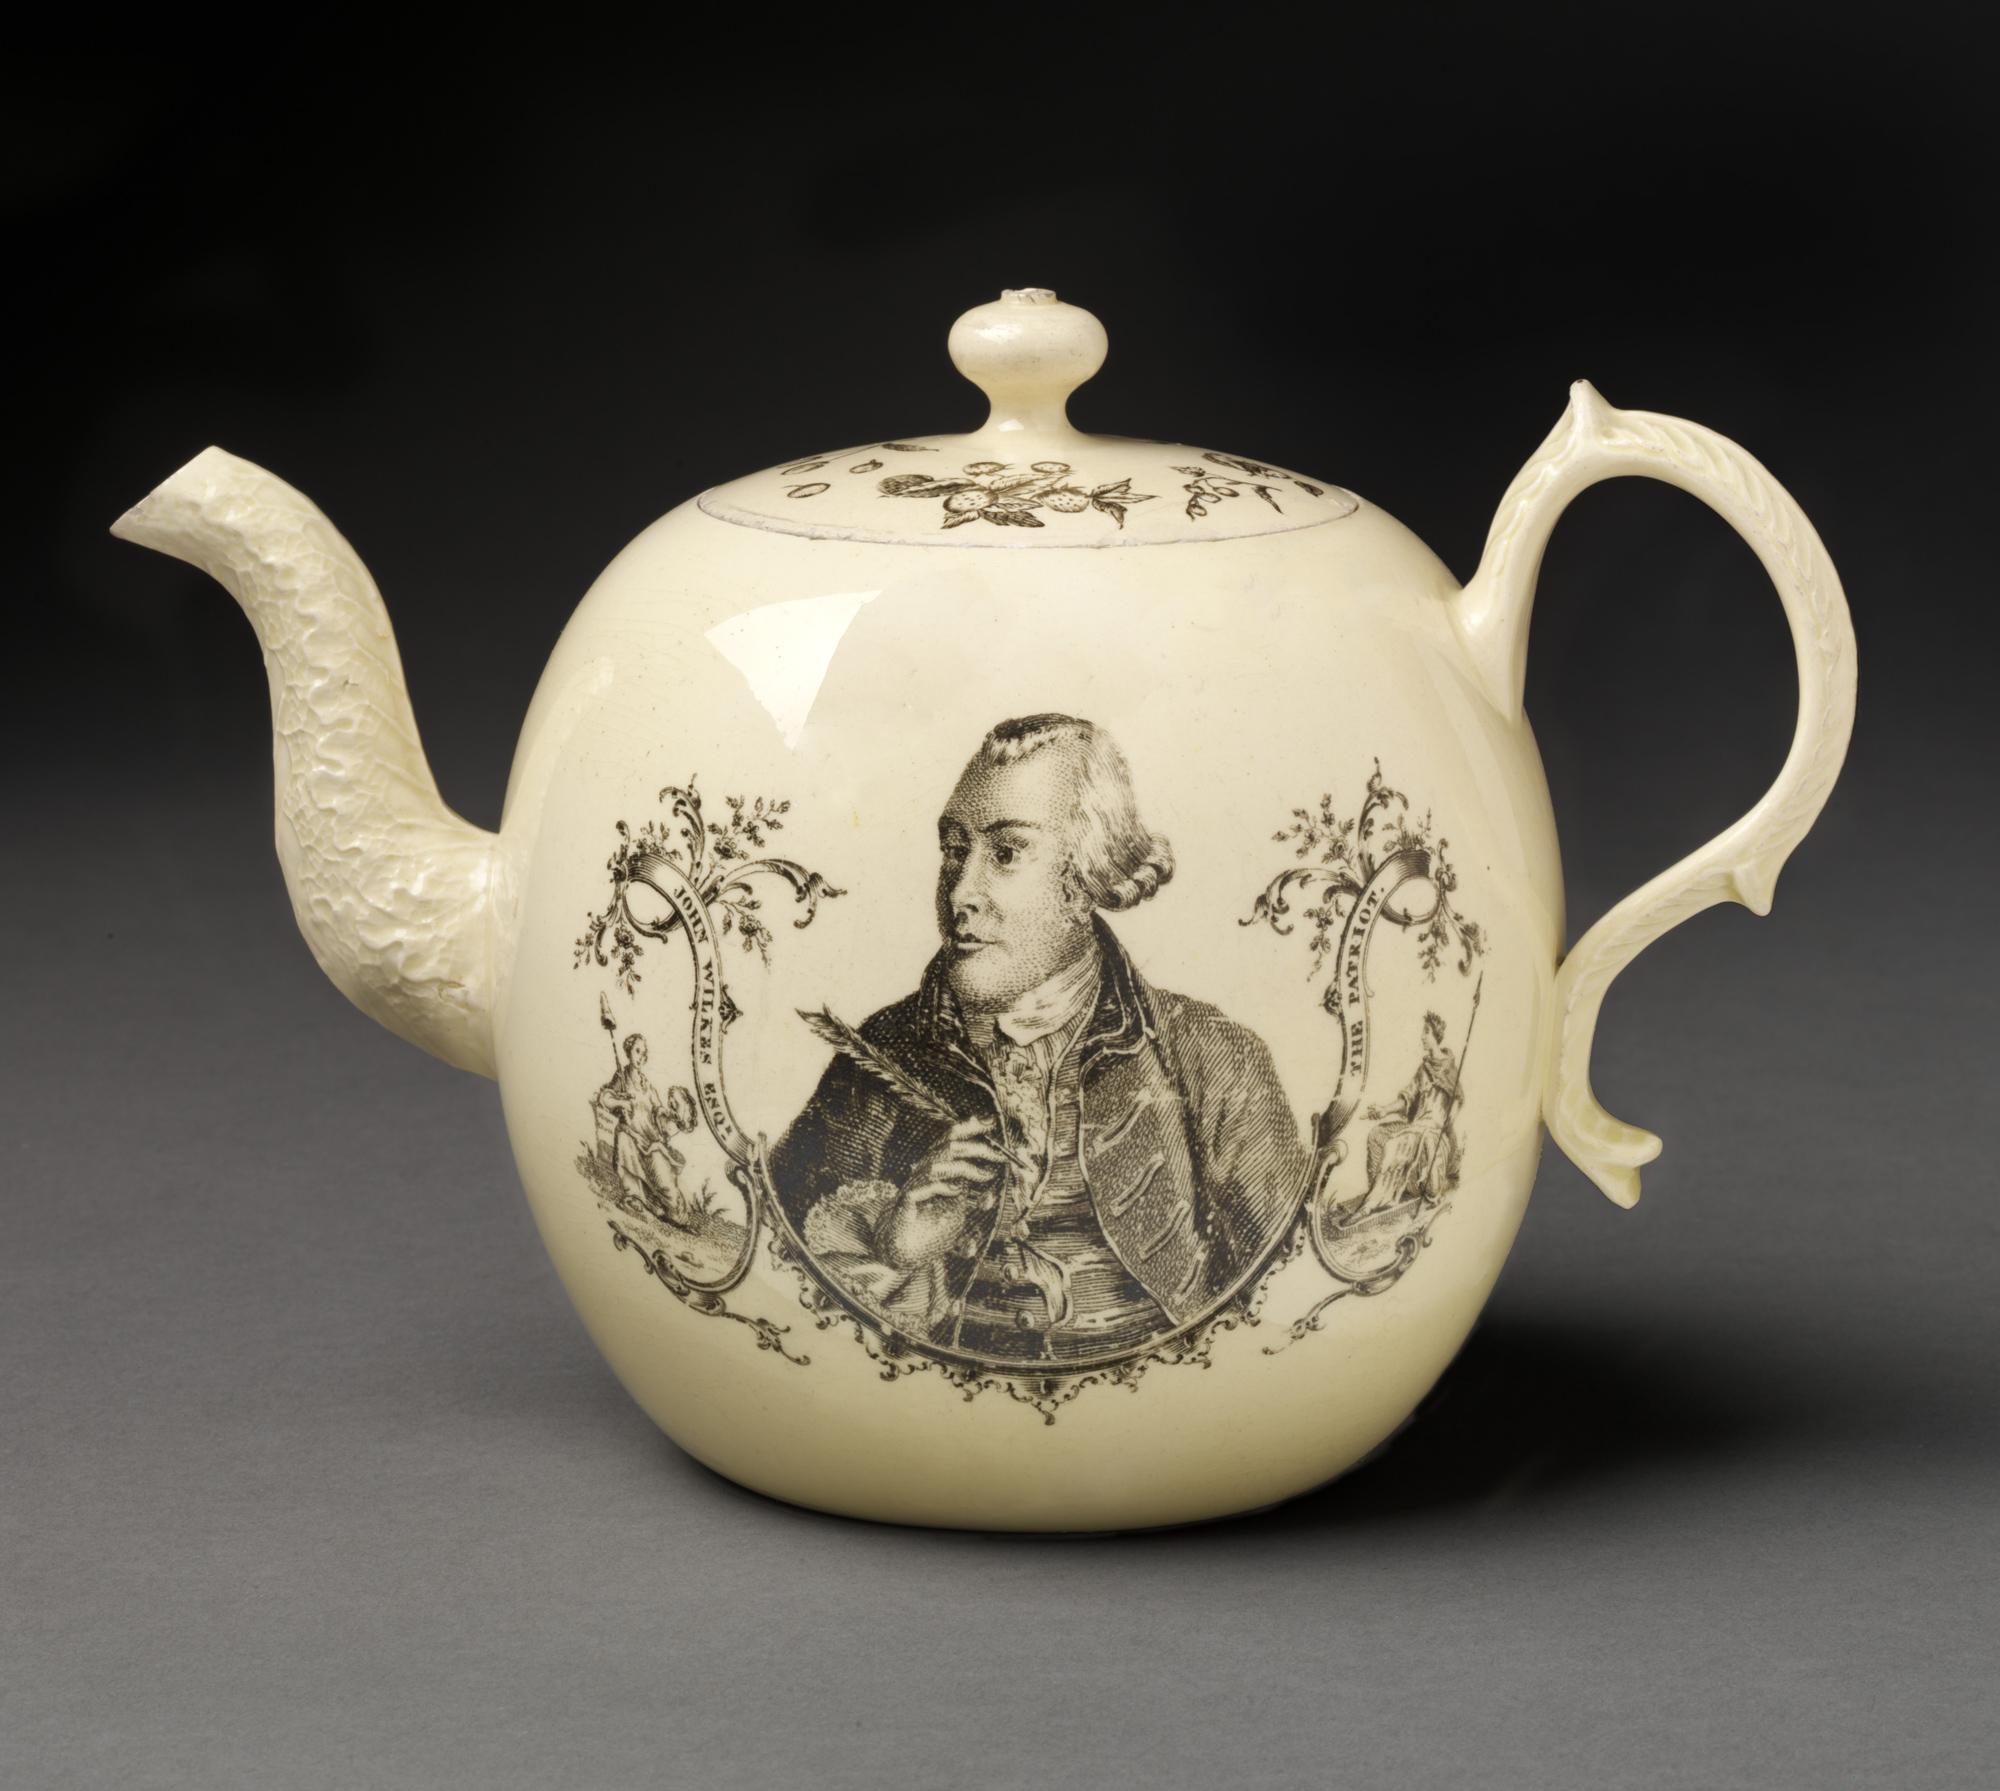 Wedgwood earthenware teapot designed by Thomas Billinge showing John Wilkes holding Magna Charta